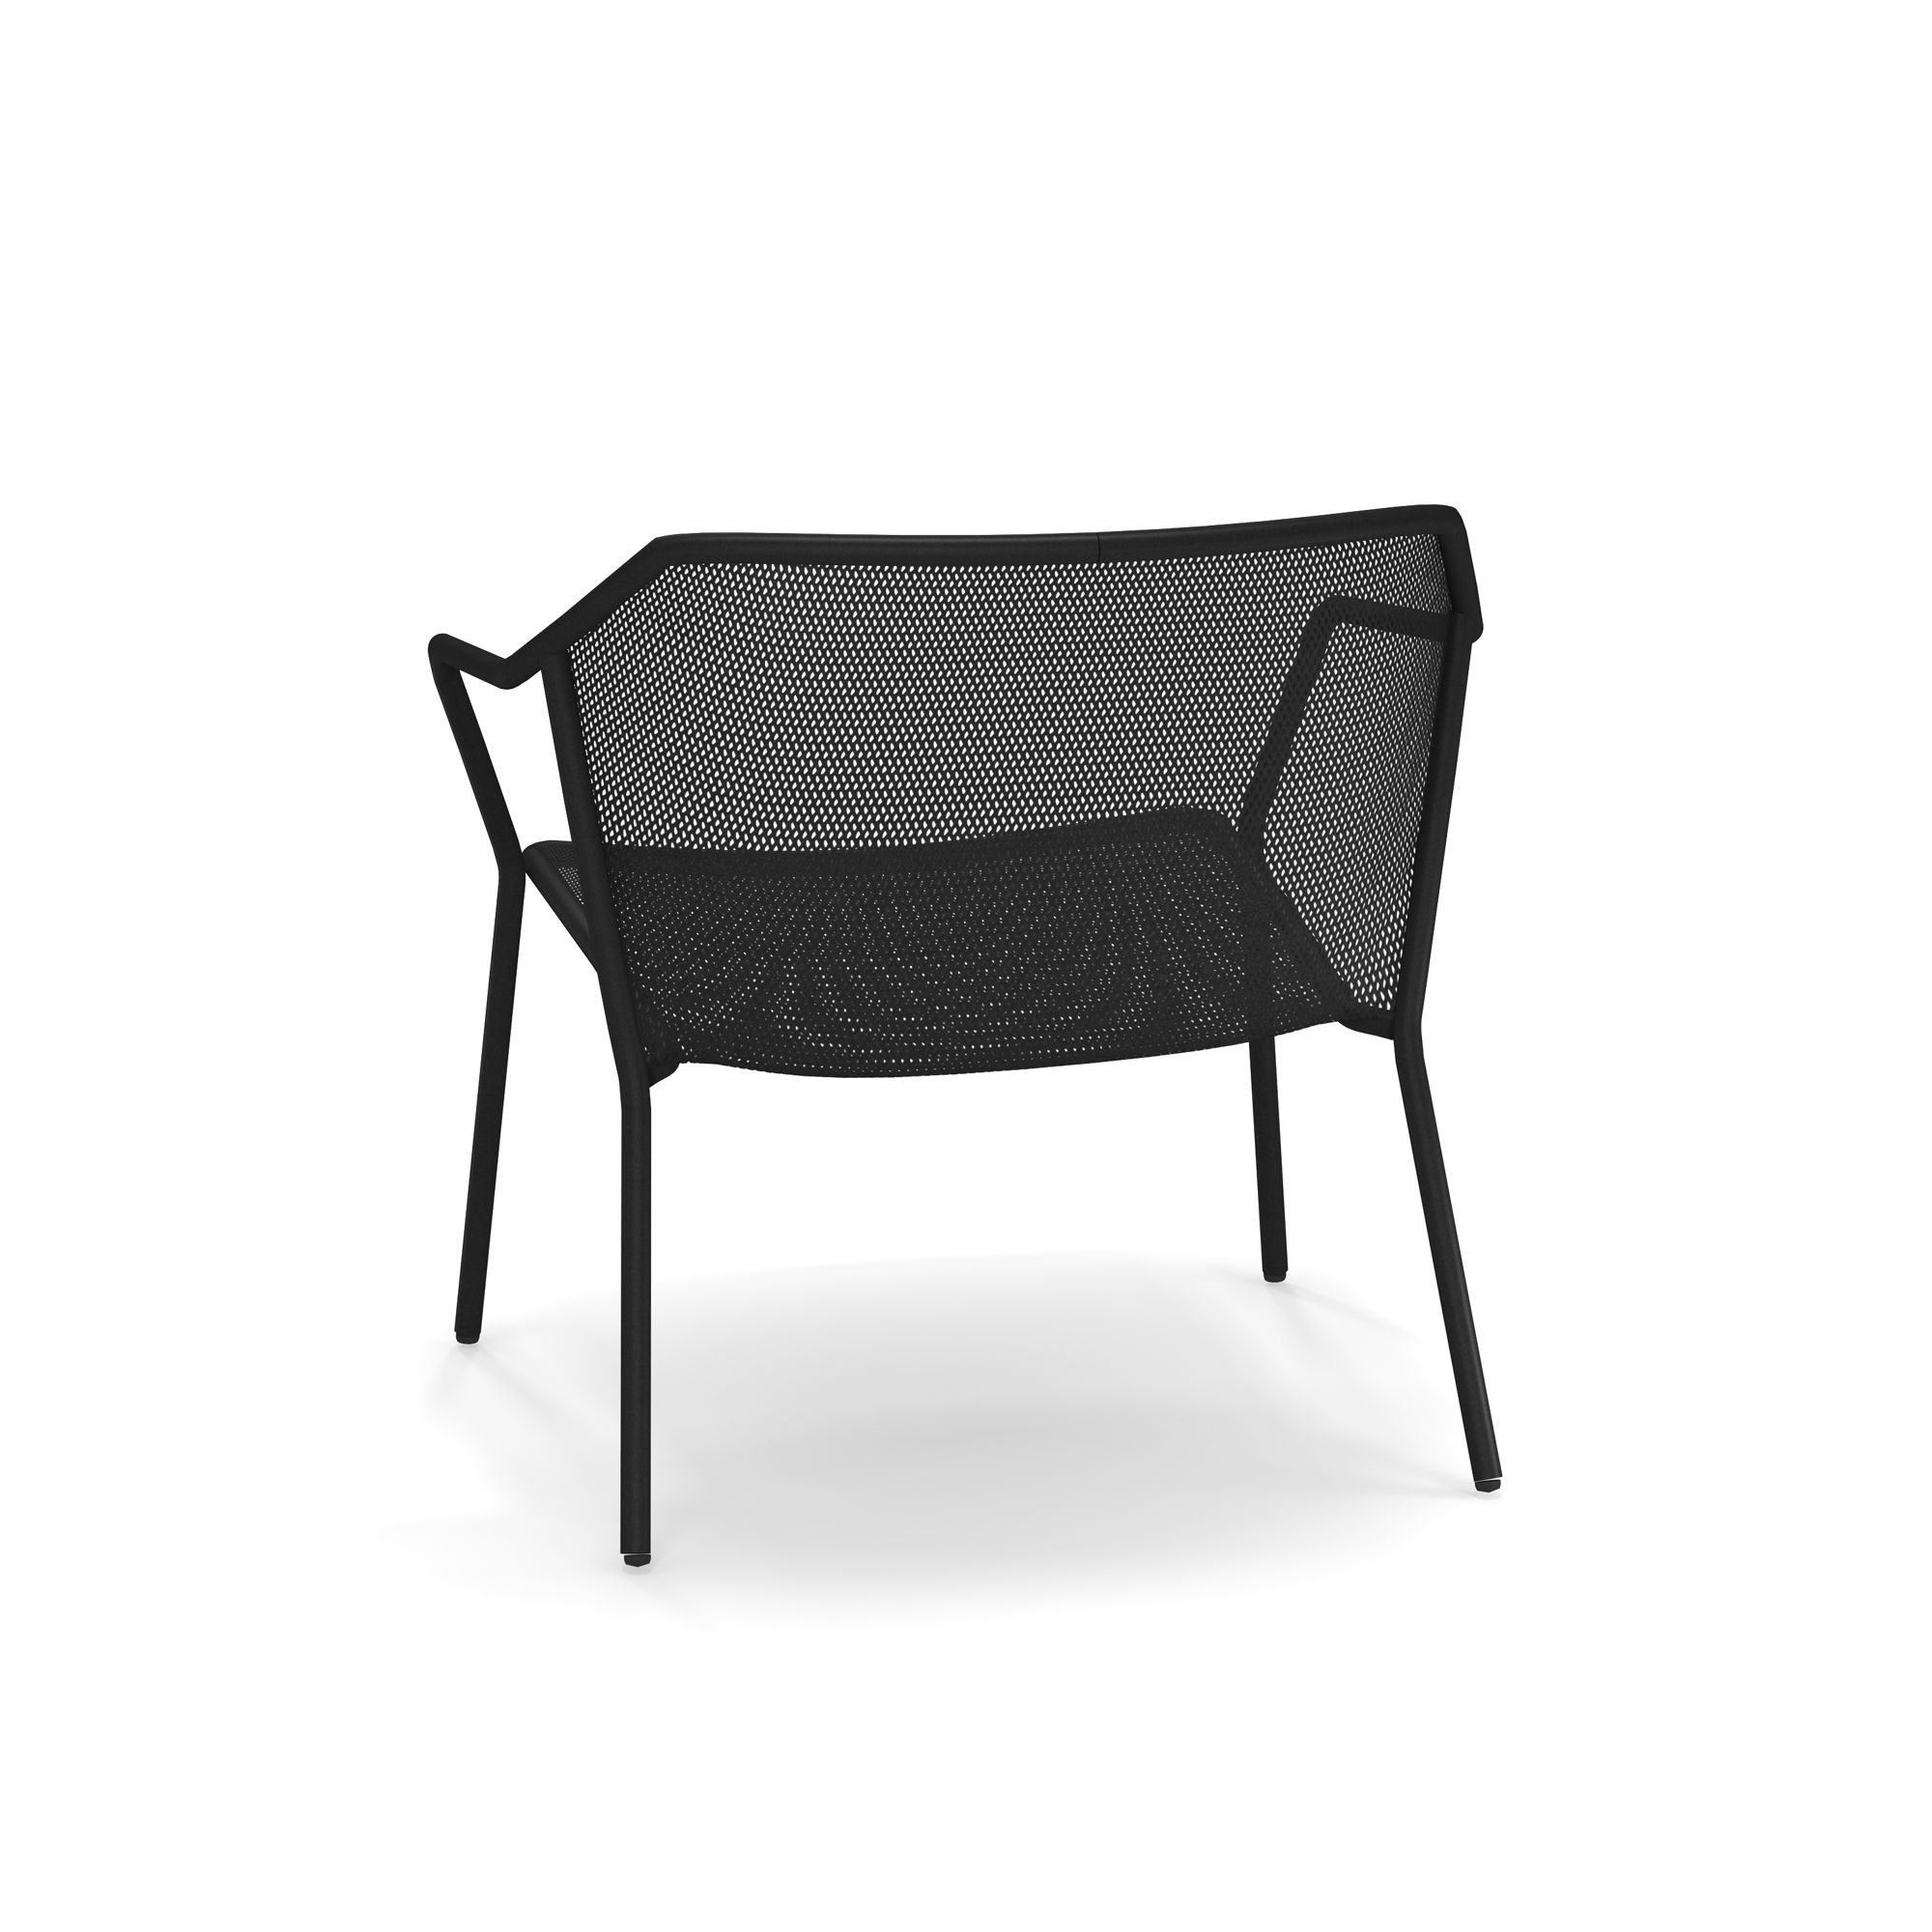 Darwin 524 lounge chair from Emu